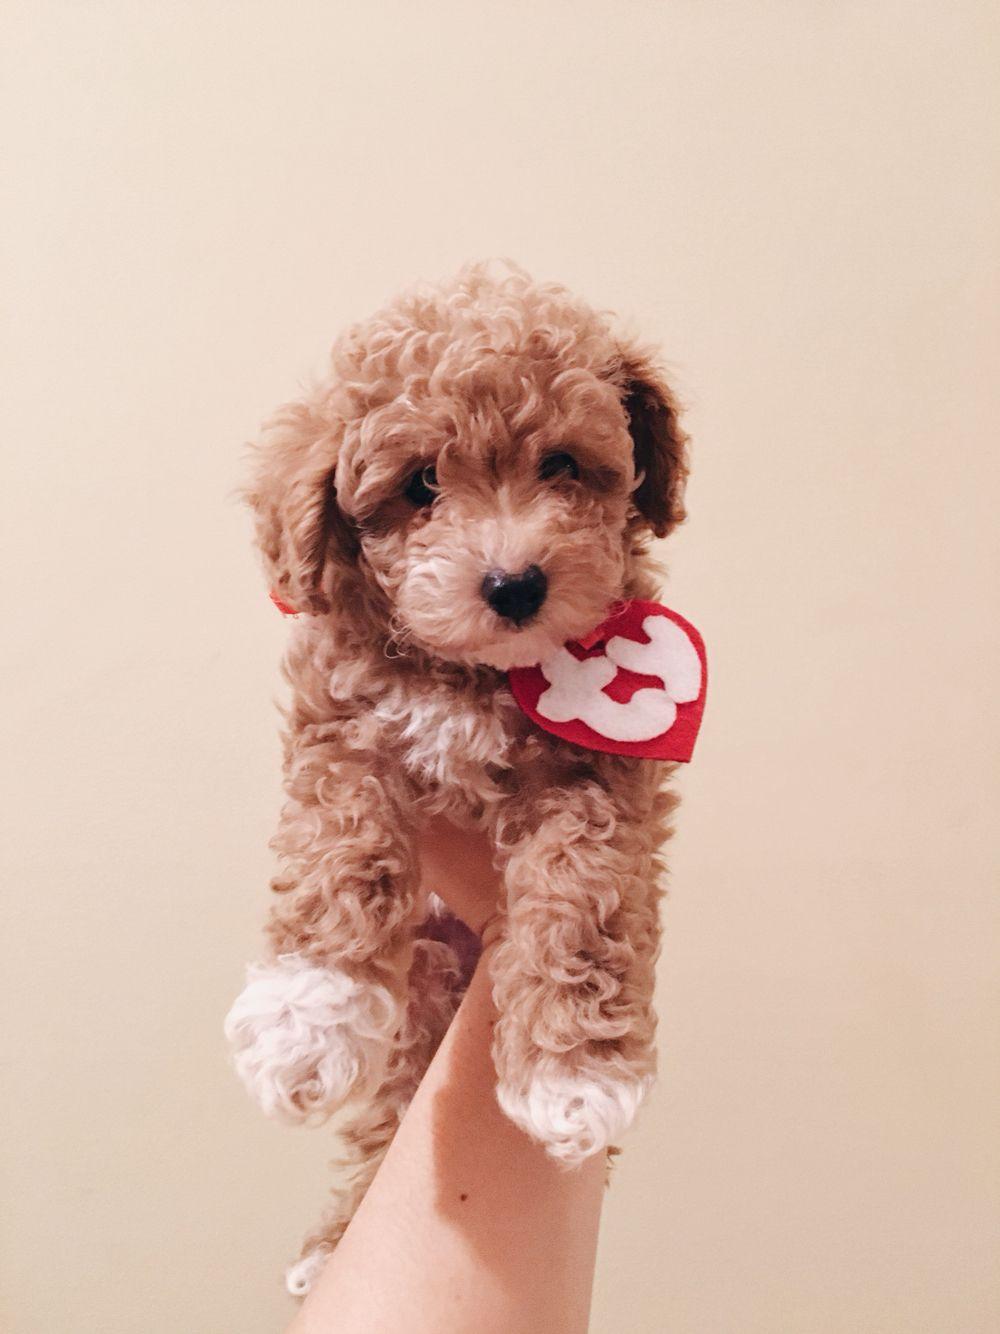 00c8e52ffd8 TY beanie baby Halloween dog costume